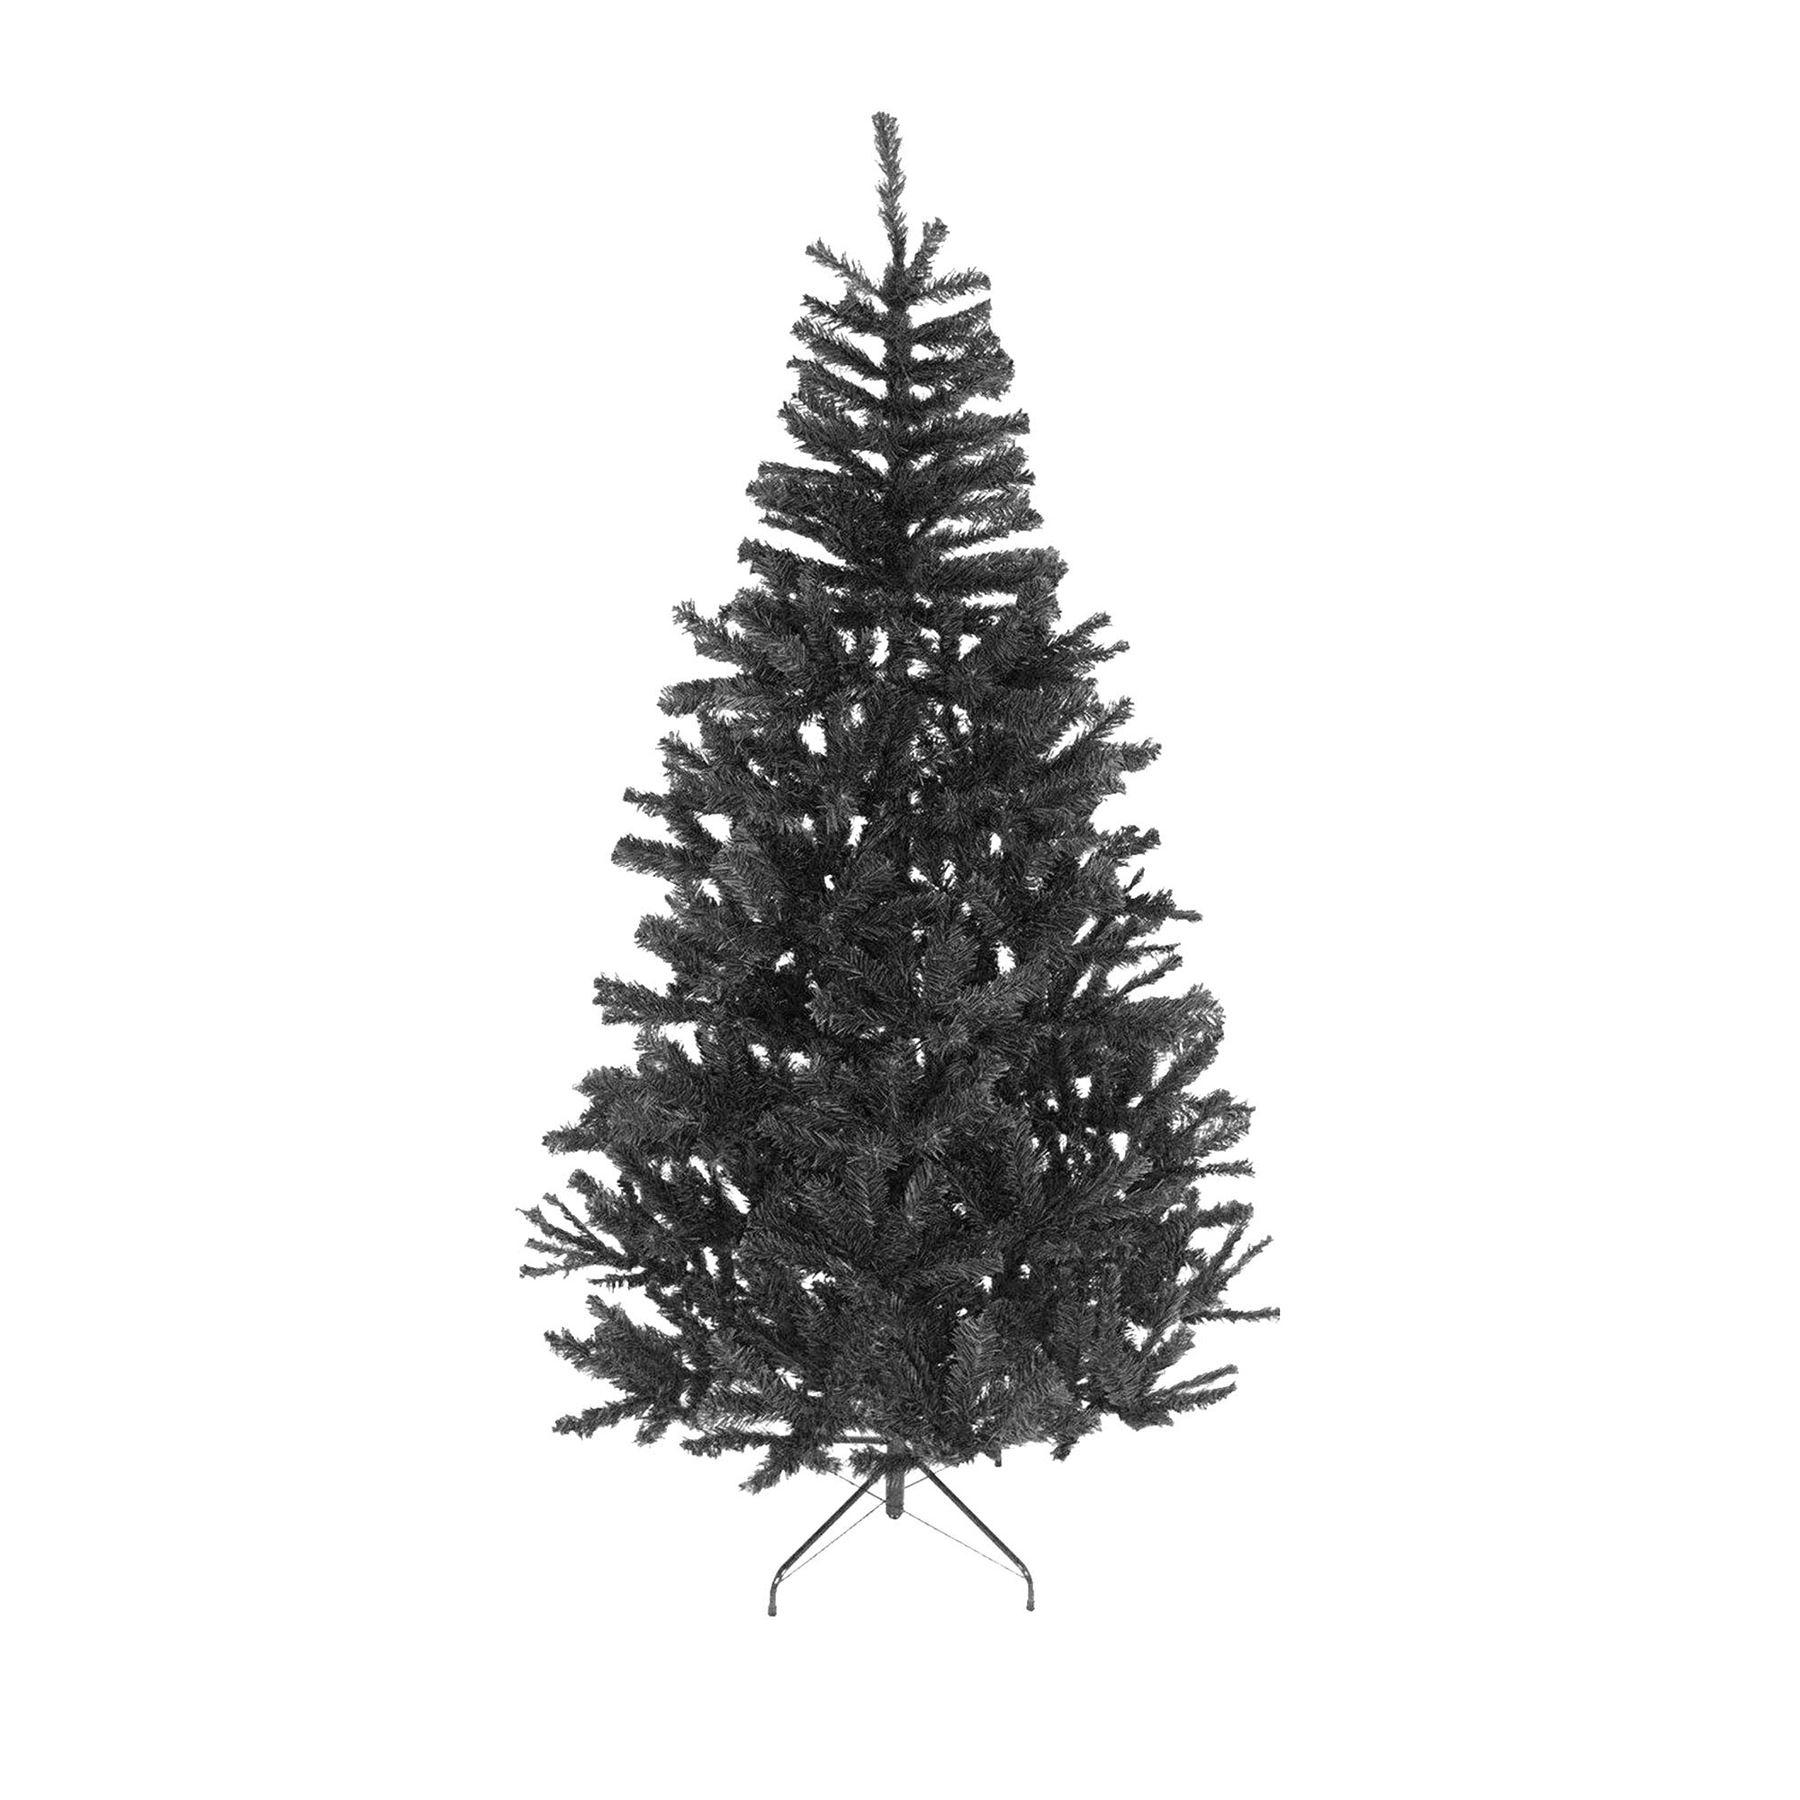 Artificial Christmas Tree Elegant Standard Led Fibre Optic Pre Lit Decoration 3535 7ft